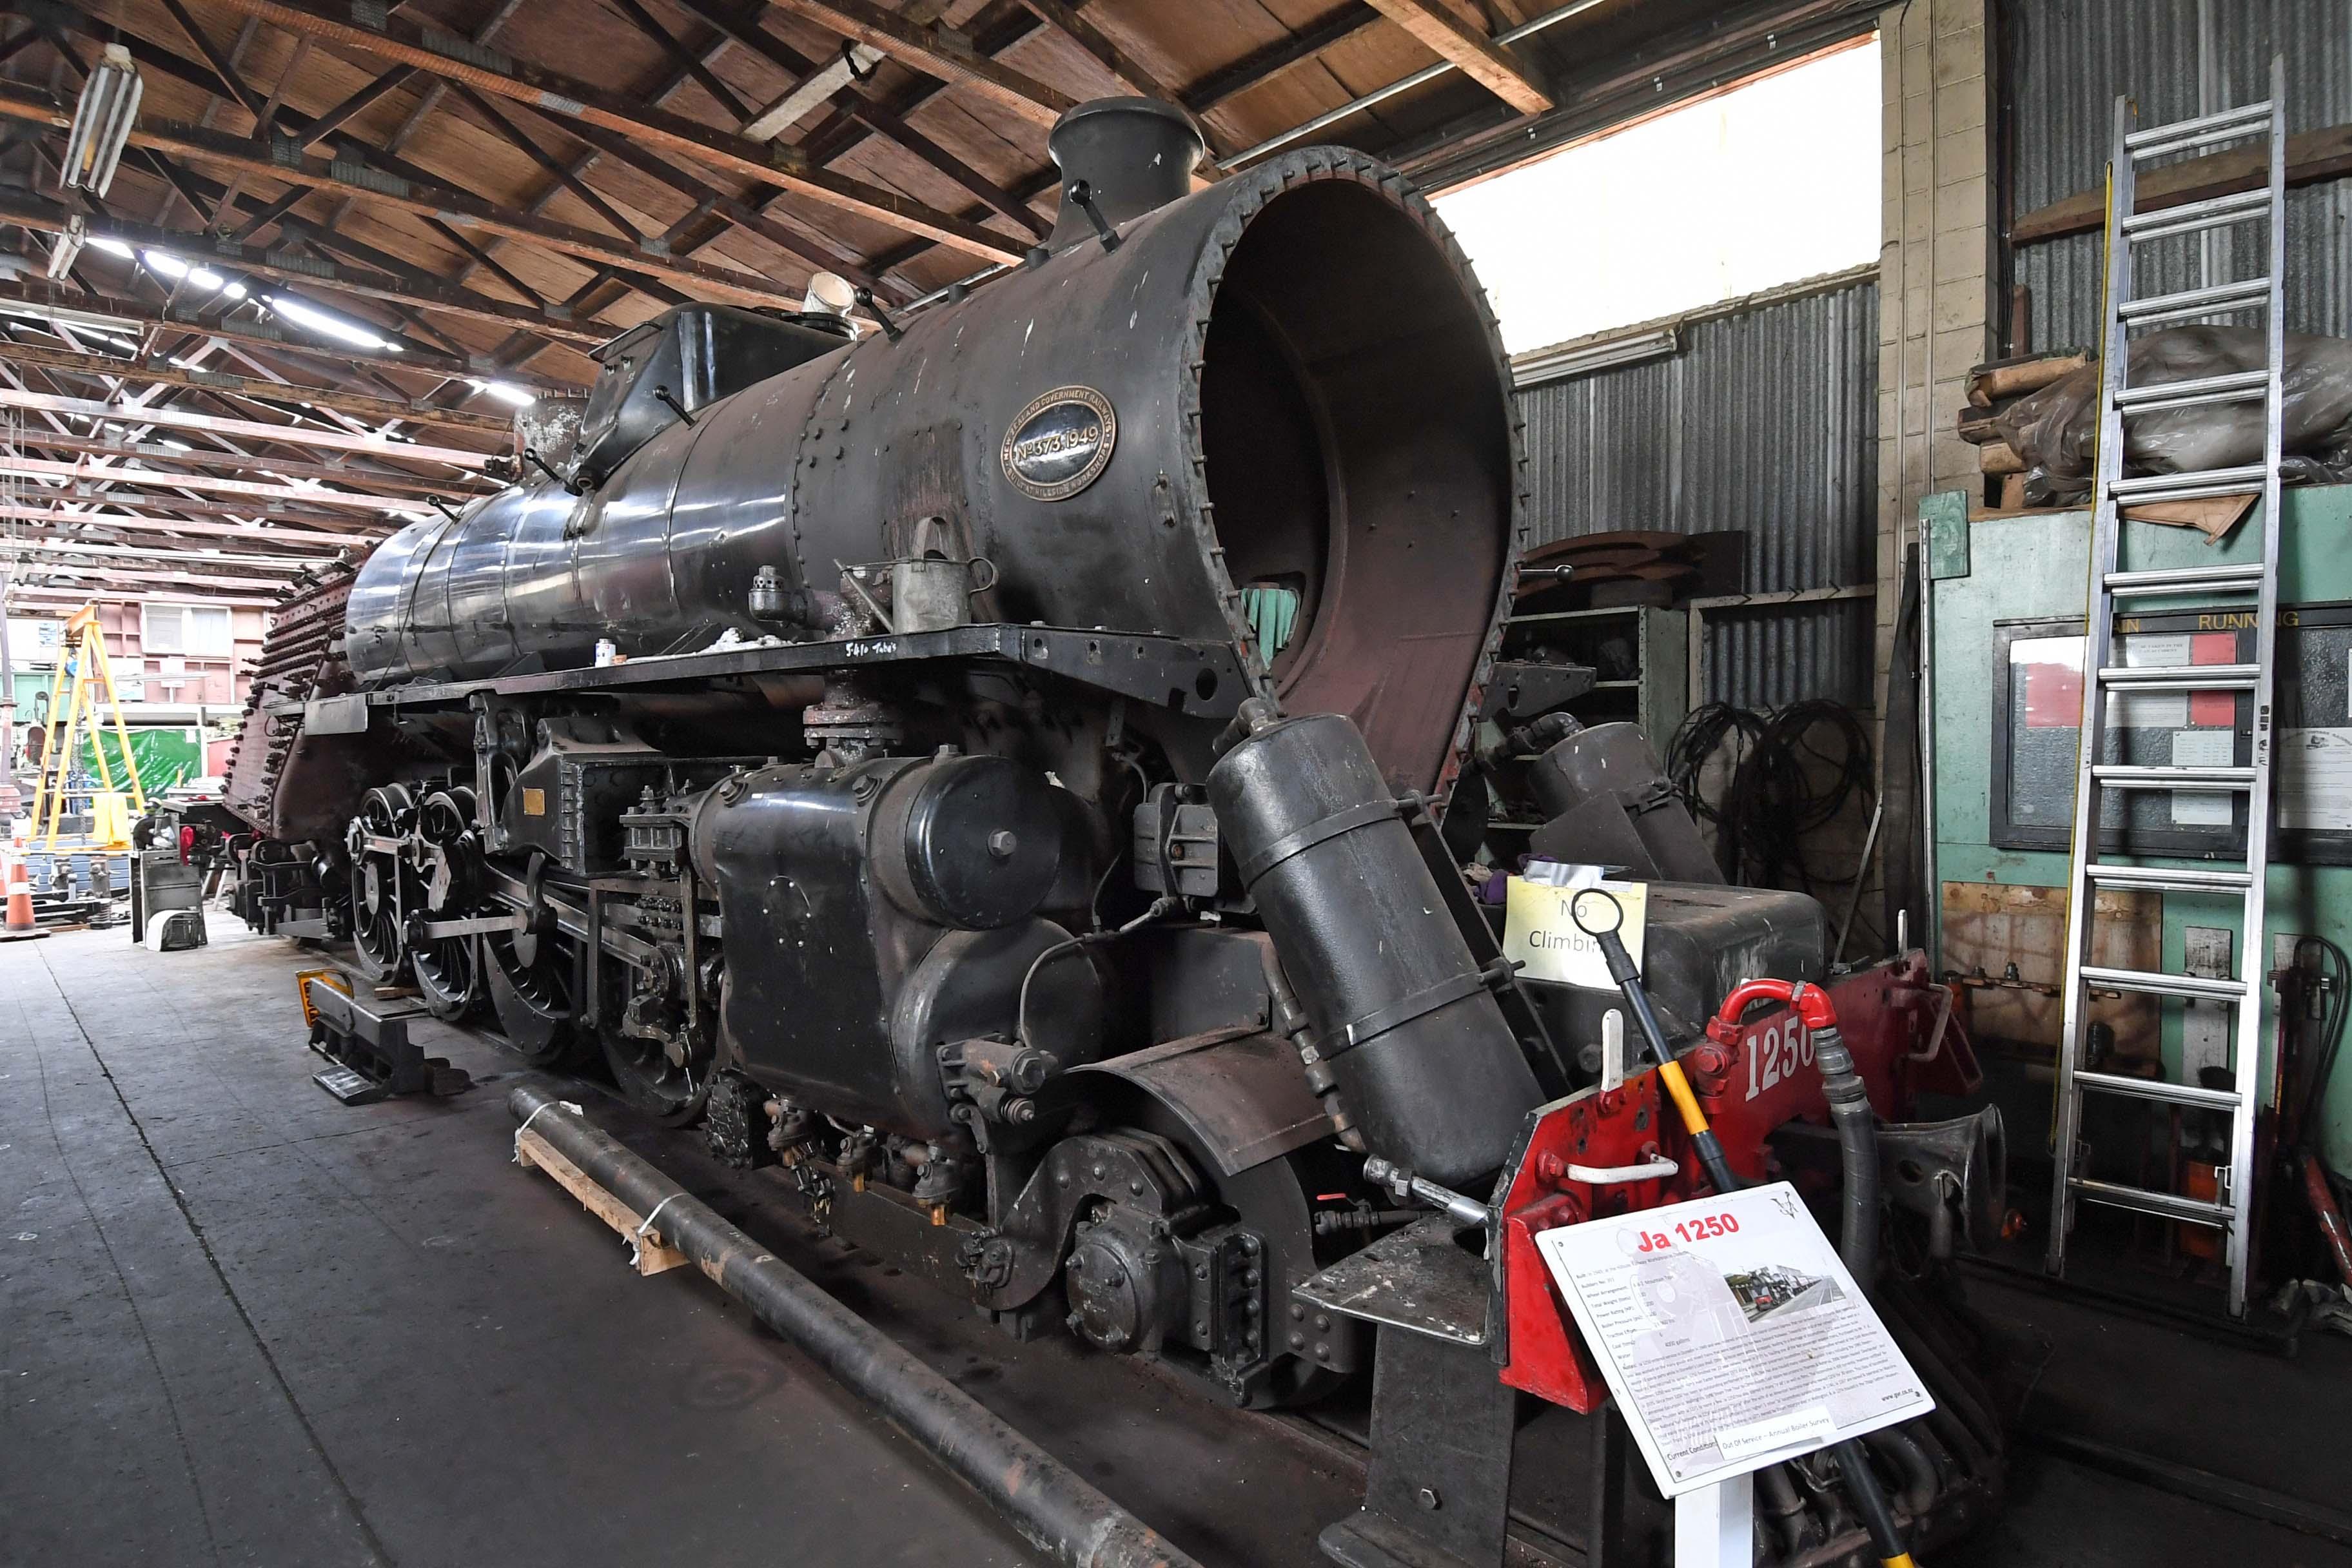 dg318301. ja 1250. pukeoware workshop. glenbrook vintage railway. north island. new zealand. 27.1.19crop